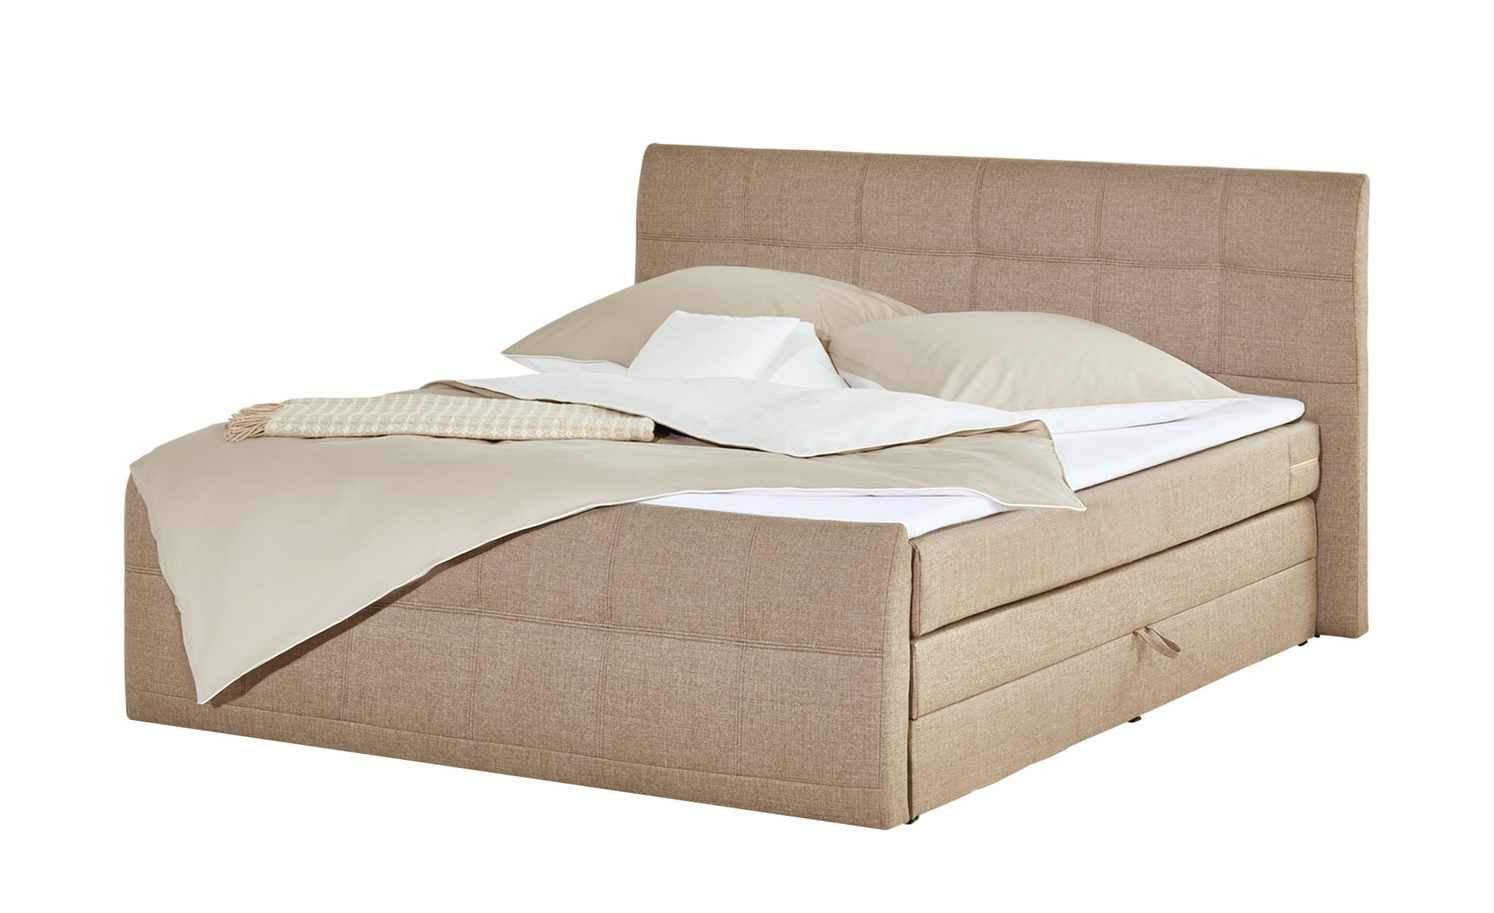 Boxspringbett 180x200 Mit Bettkasten Earl Boxspringbett Bett